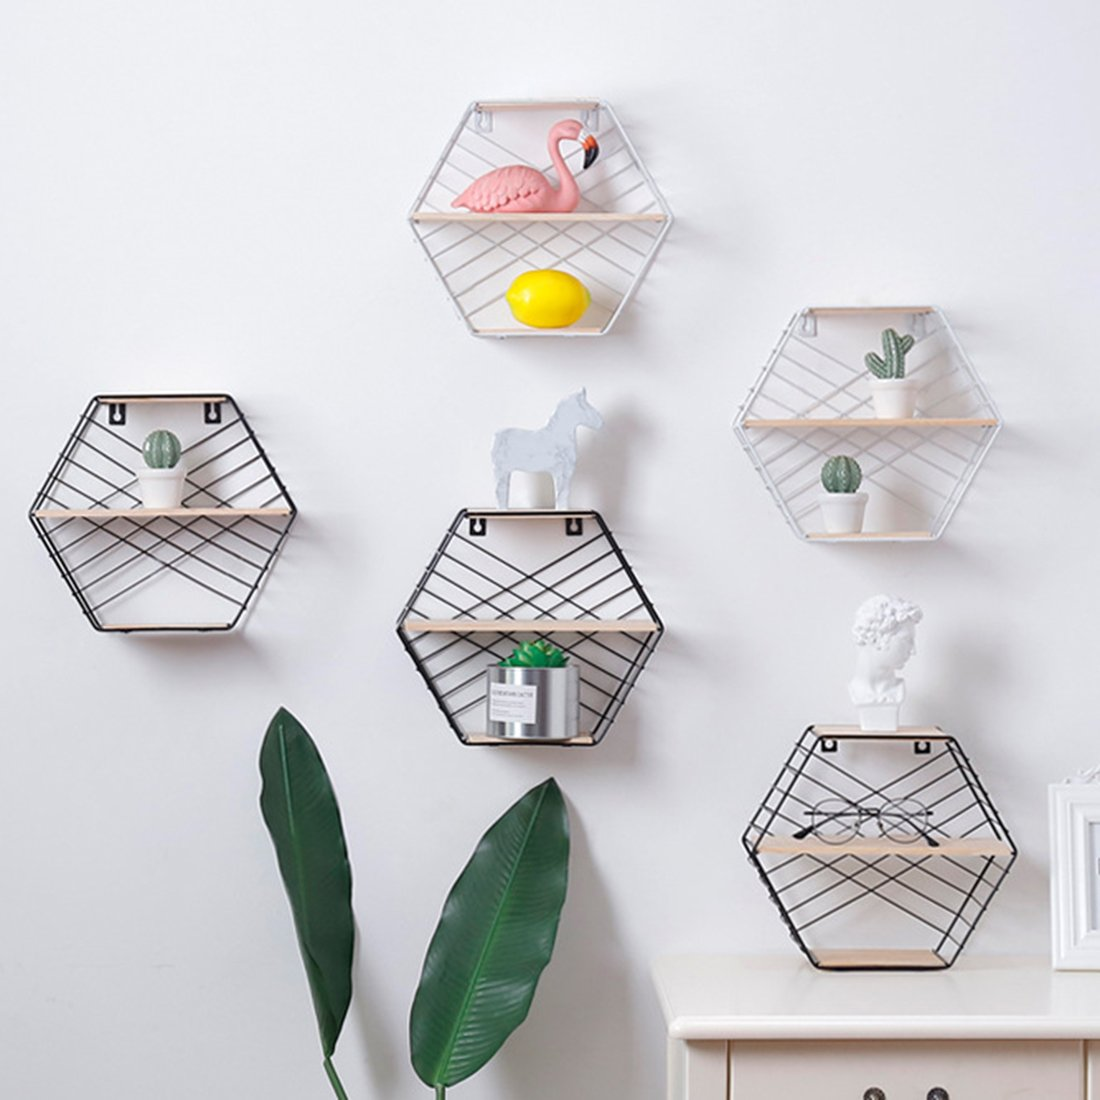 HMANE 3-Tier Wall Storage Rack,Decorative Hanging Hexagon Shelf Organizer for Kitchen,Bathroom,Office - Black by HMANE (Image #5)